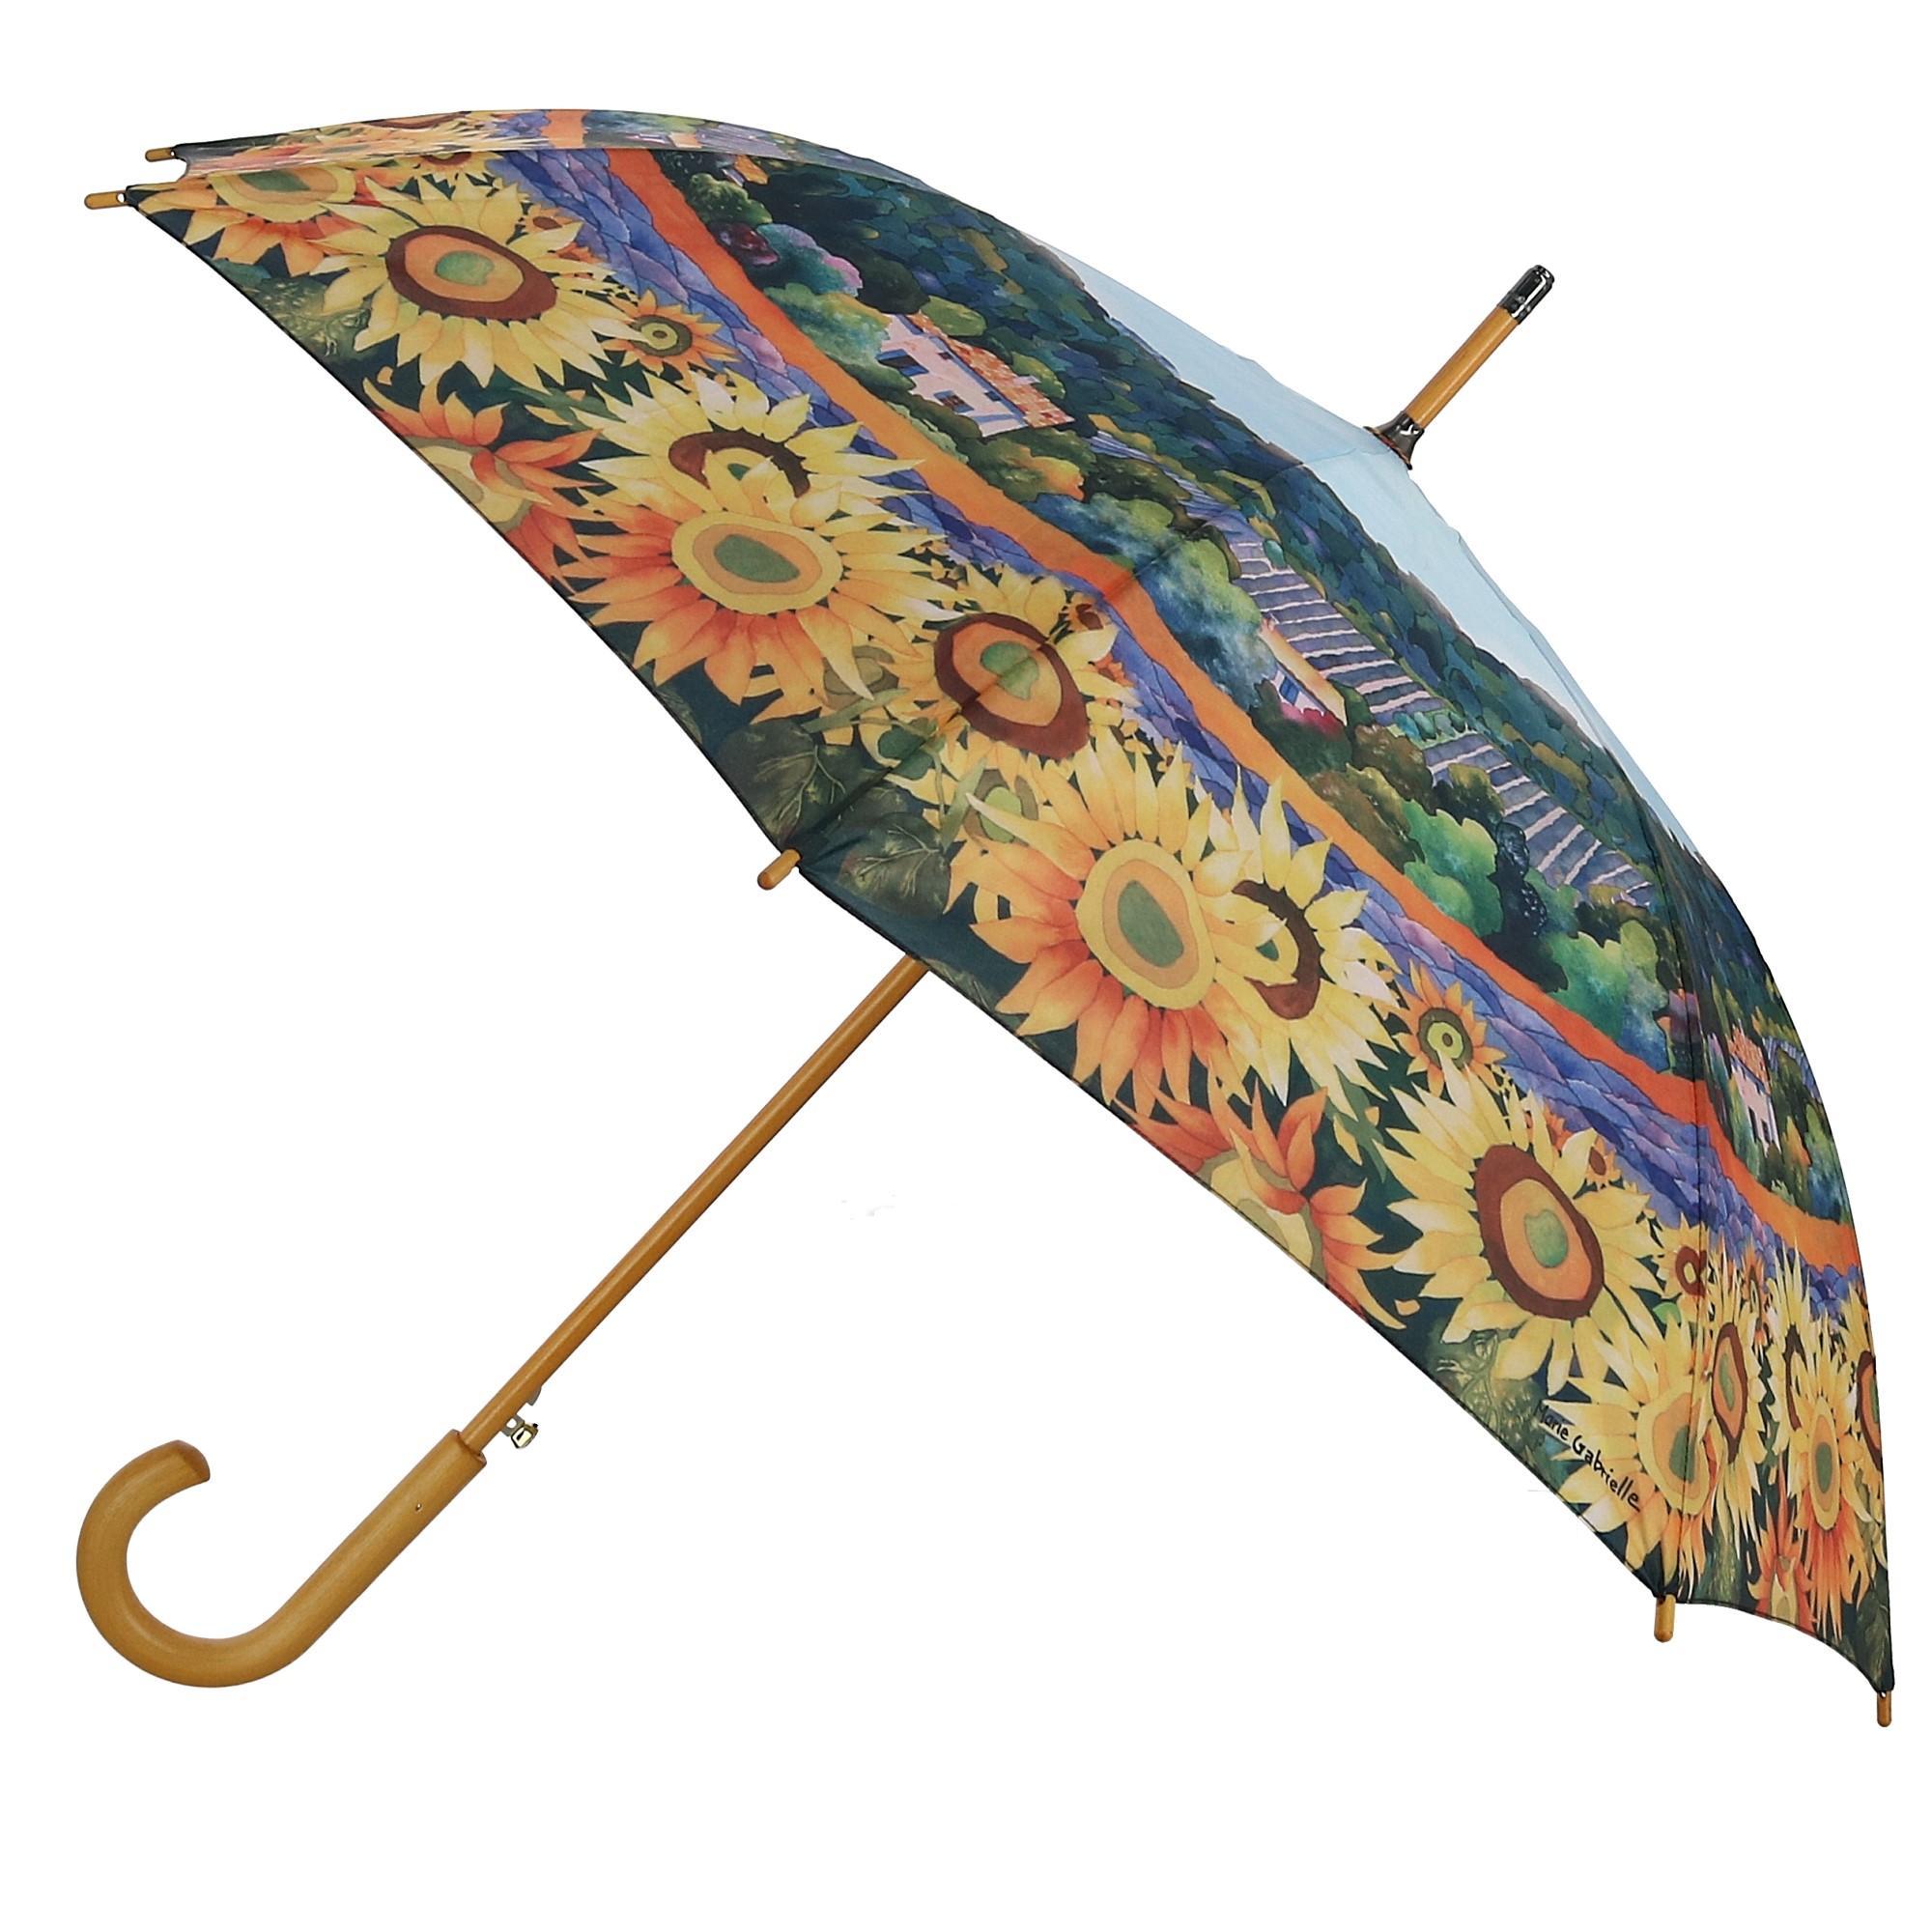 2689af264f6d Details about New CTM Women's Auto Open Sunflower Print Stick Umbrella